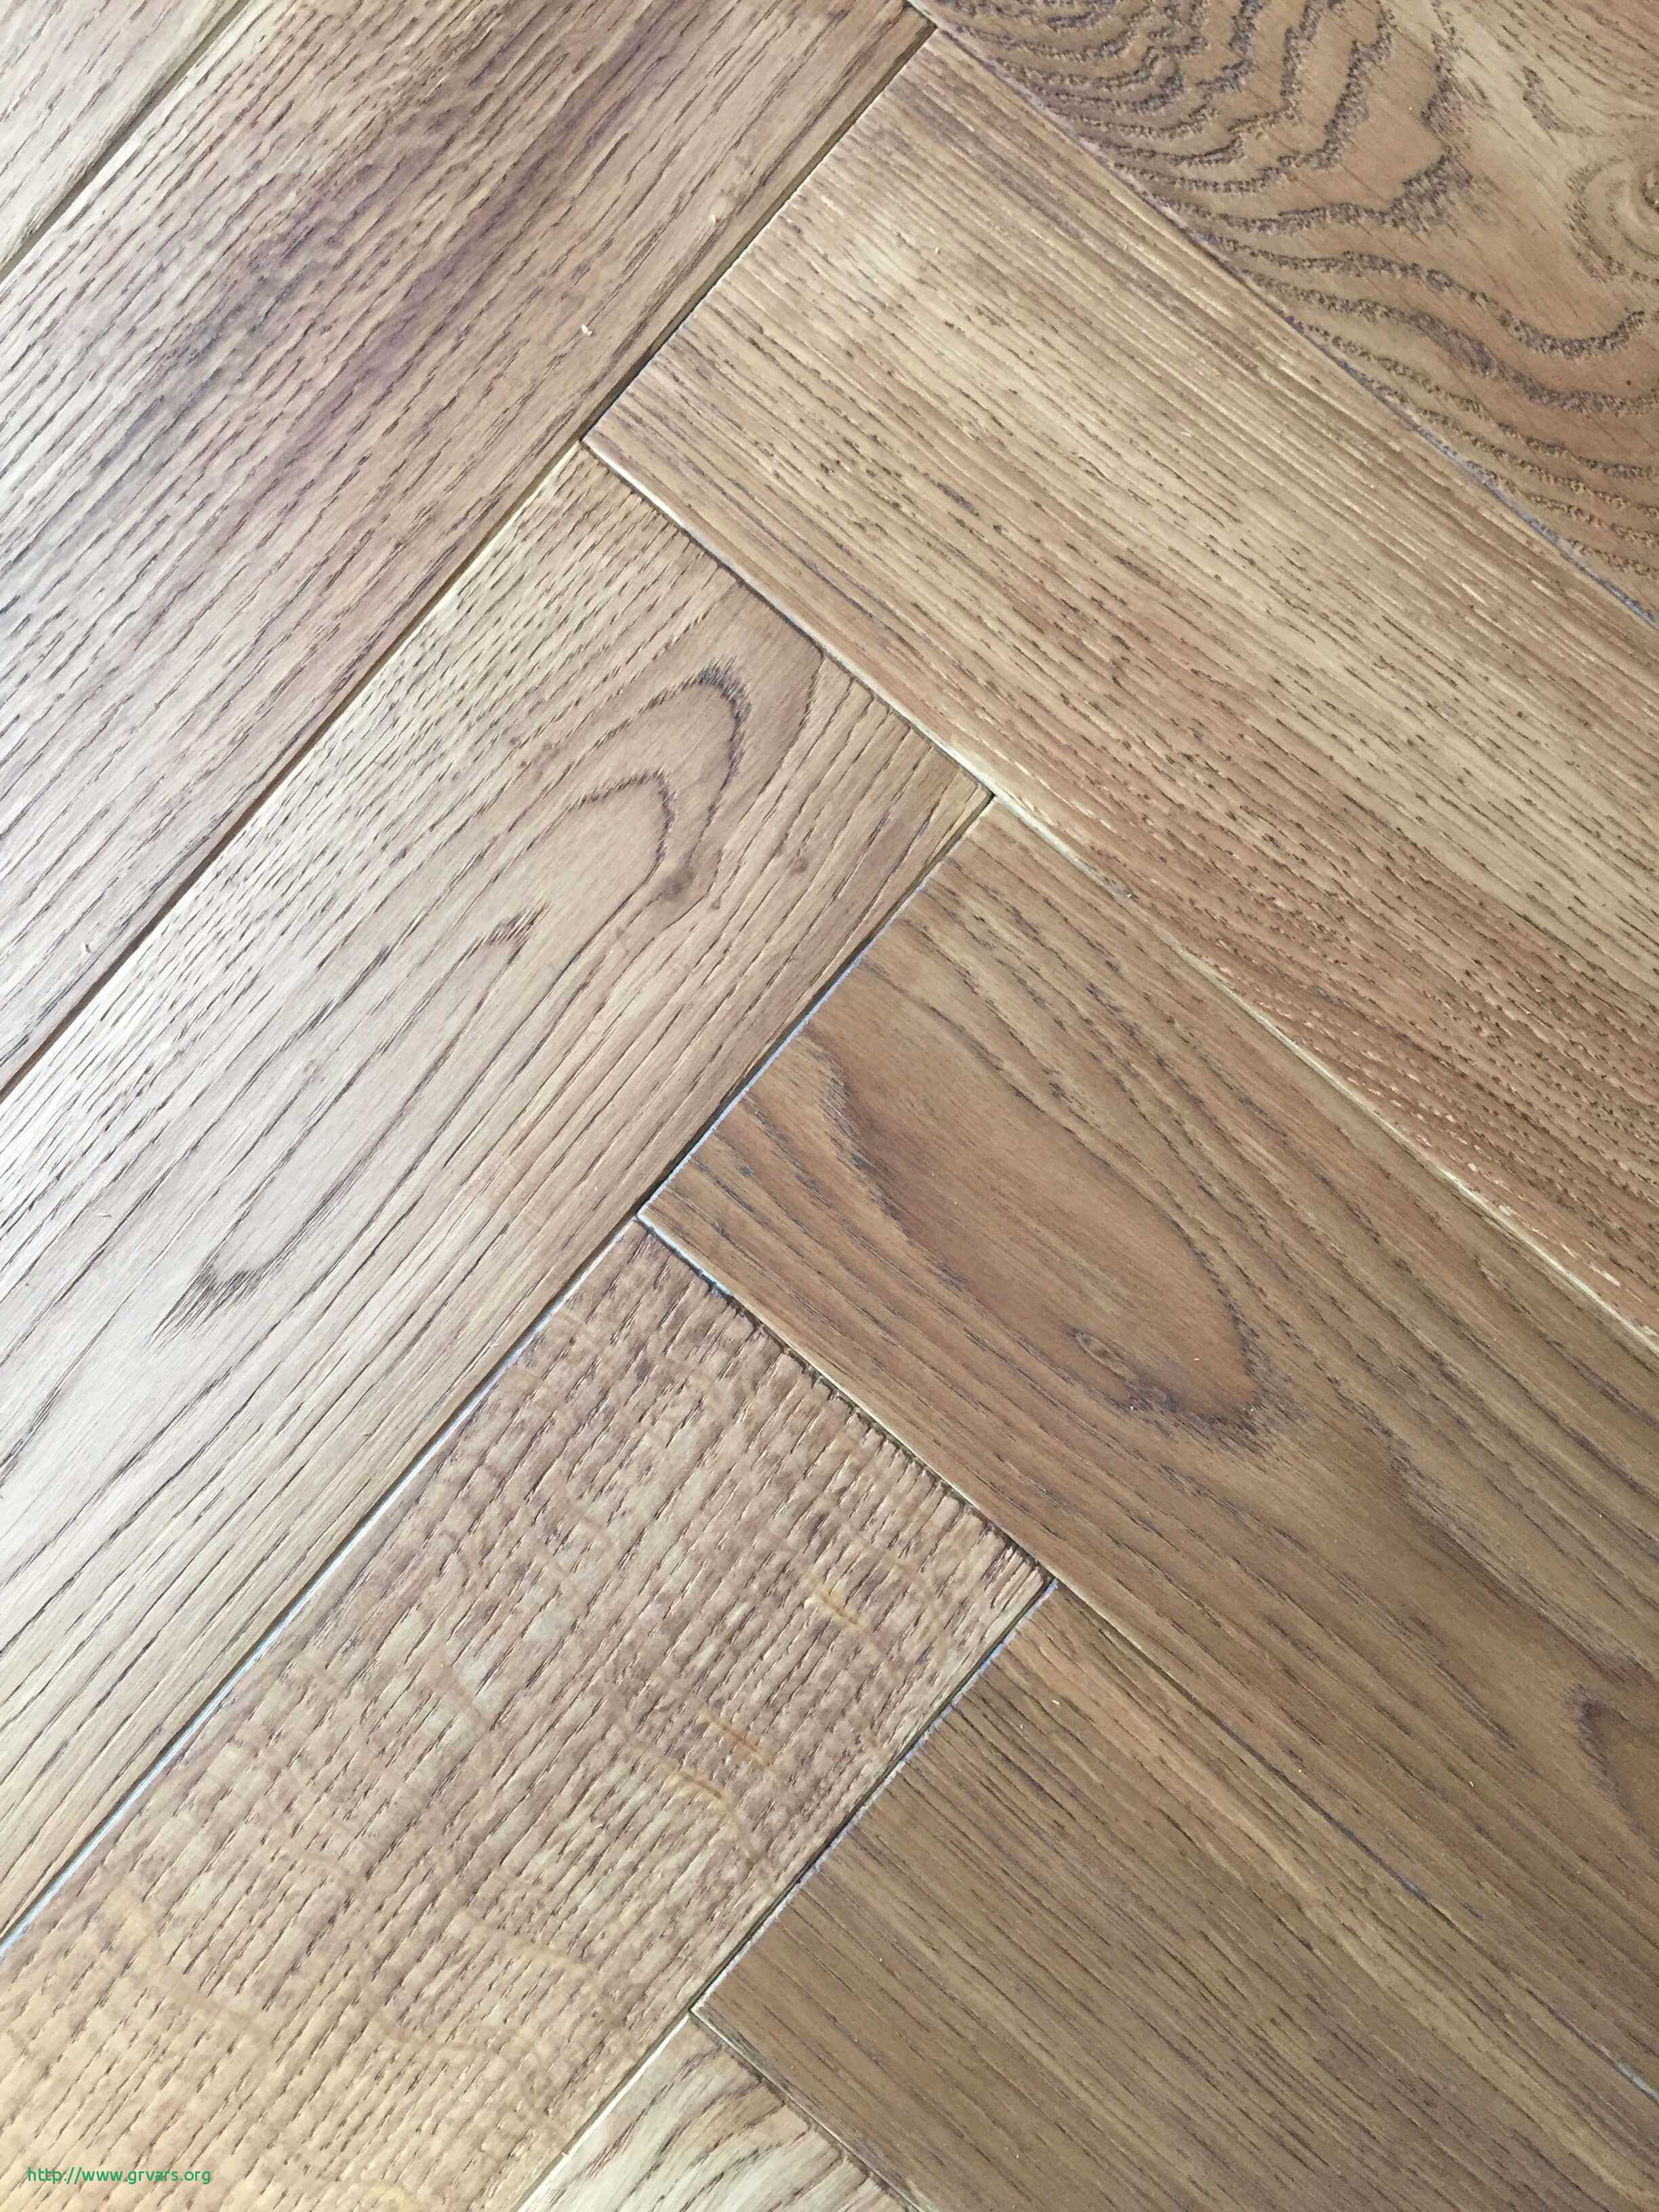 8 wide plank hardwood flooring of 21 meilleur de what is better laminate or vinyl flooring ideas blog with 21 photos of the 21 meilleur de what is better laminate or vinyl flooring